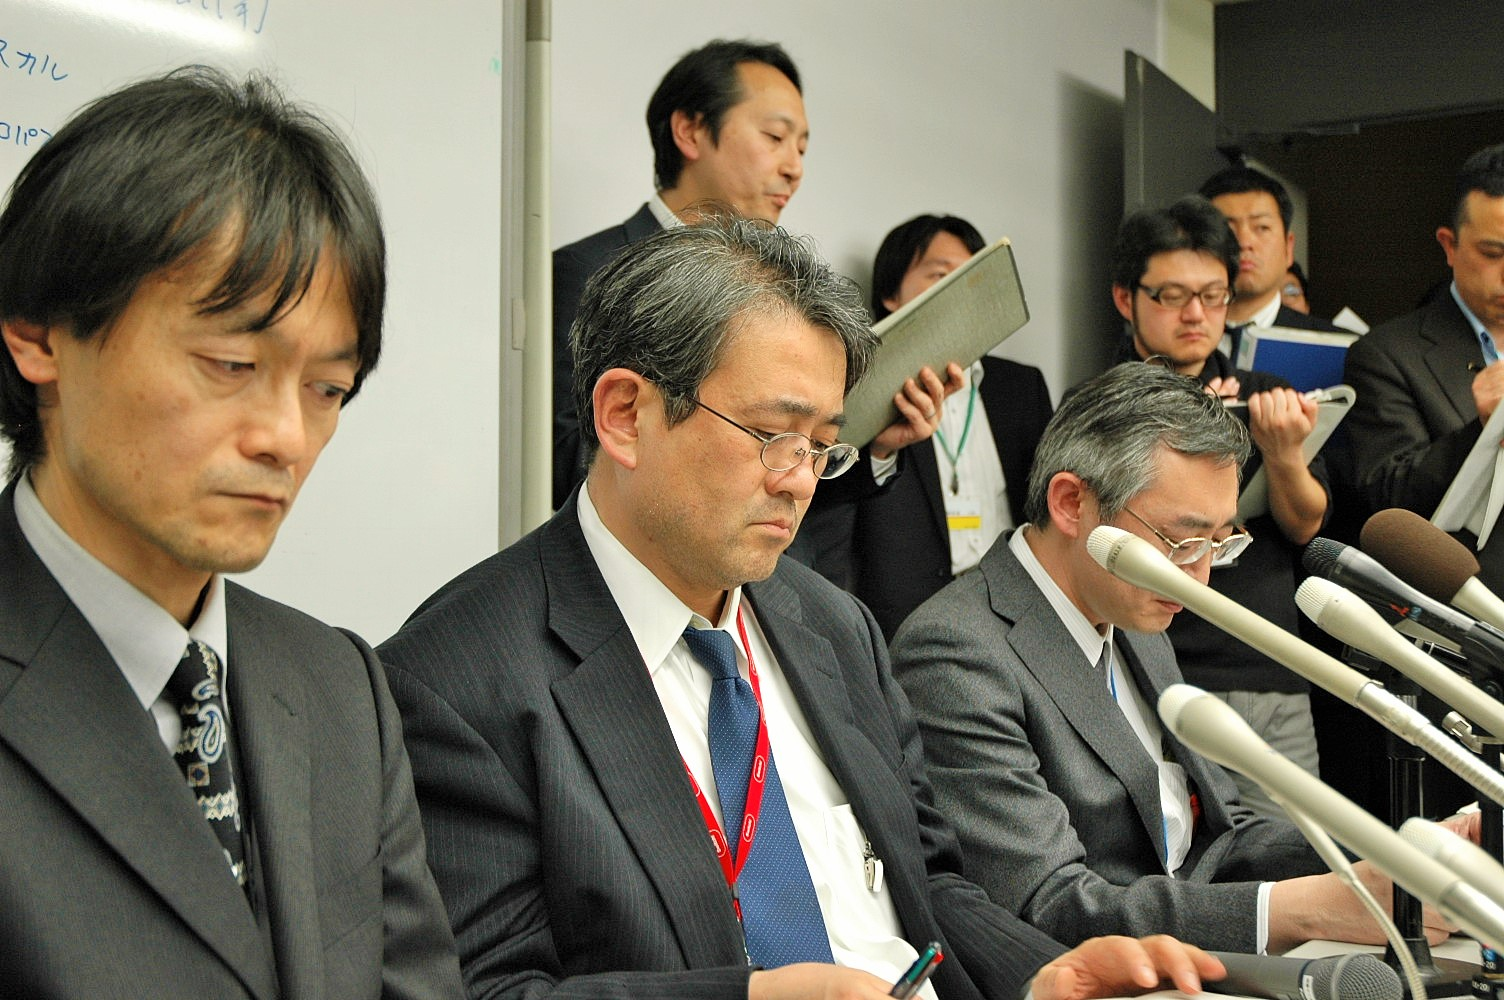 写真・図版 : 東京電力本店での記者会見=2011年3月15日午前1時16分、東京・内幸町で